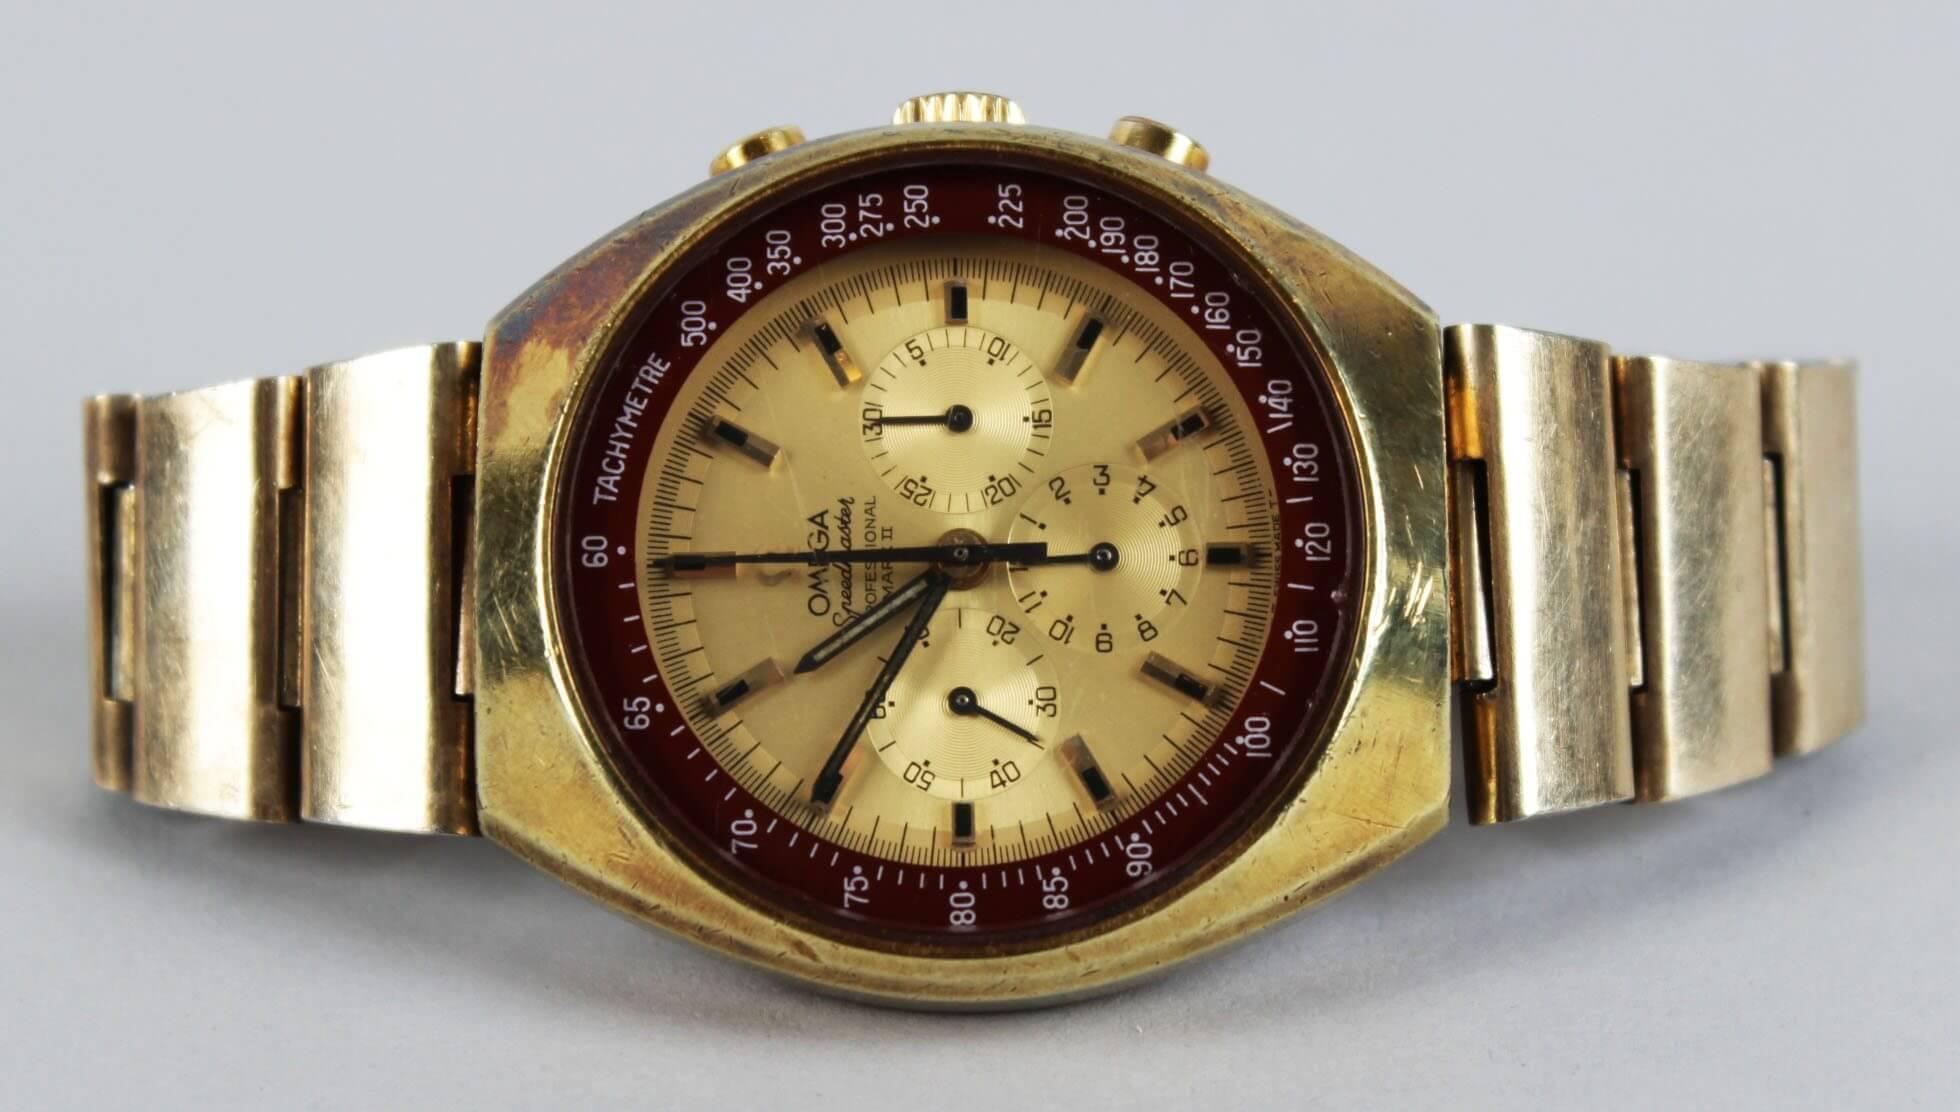 1971 Super Rare Omega Speedmaster Mark II Watch